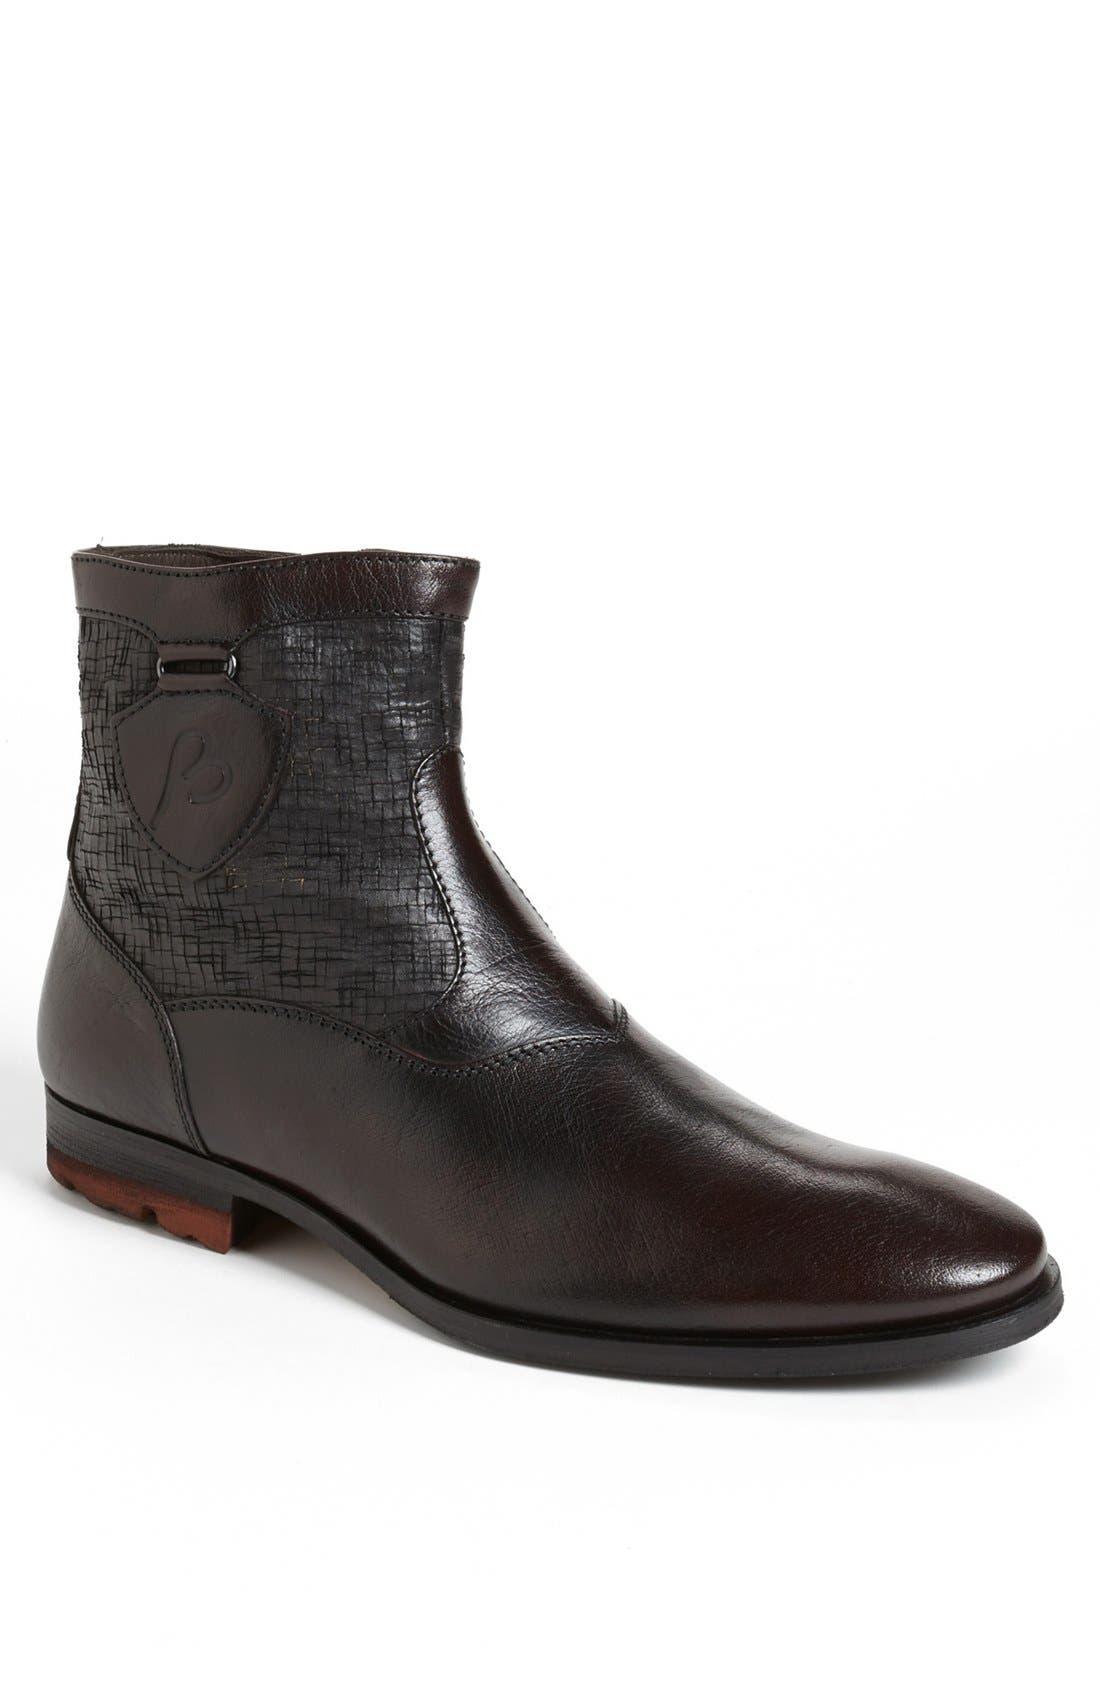 Main Image - Bacco Bucci 'Devito' Zip boot (Men) (Online Only)